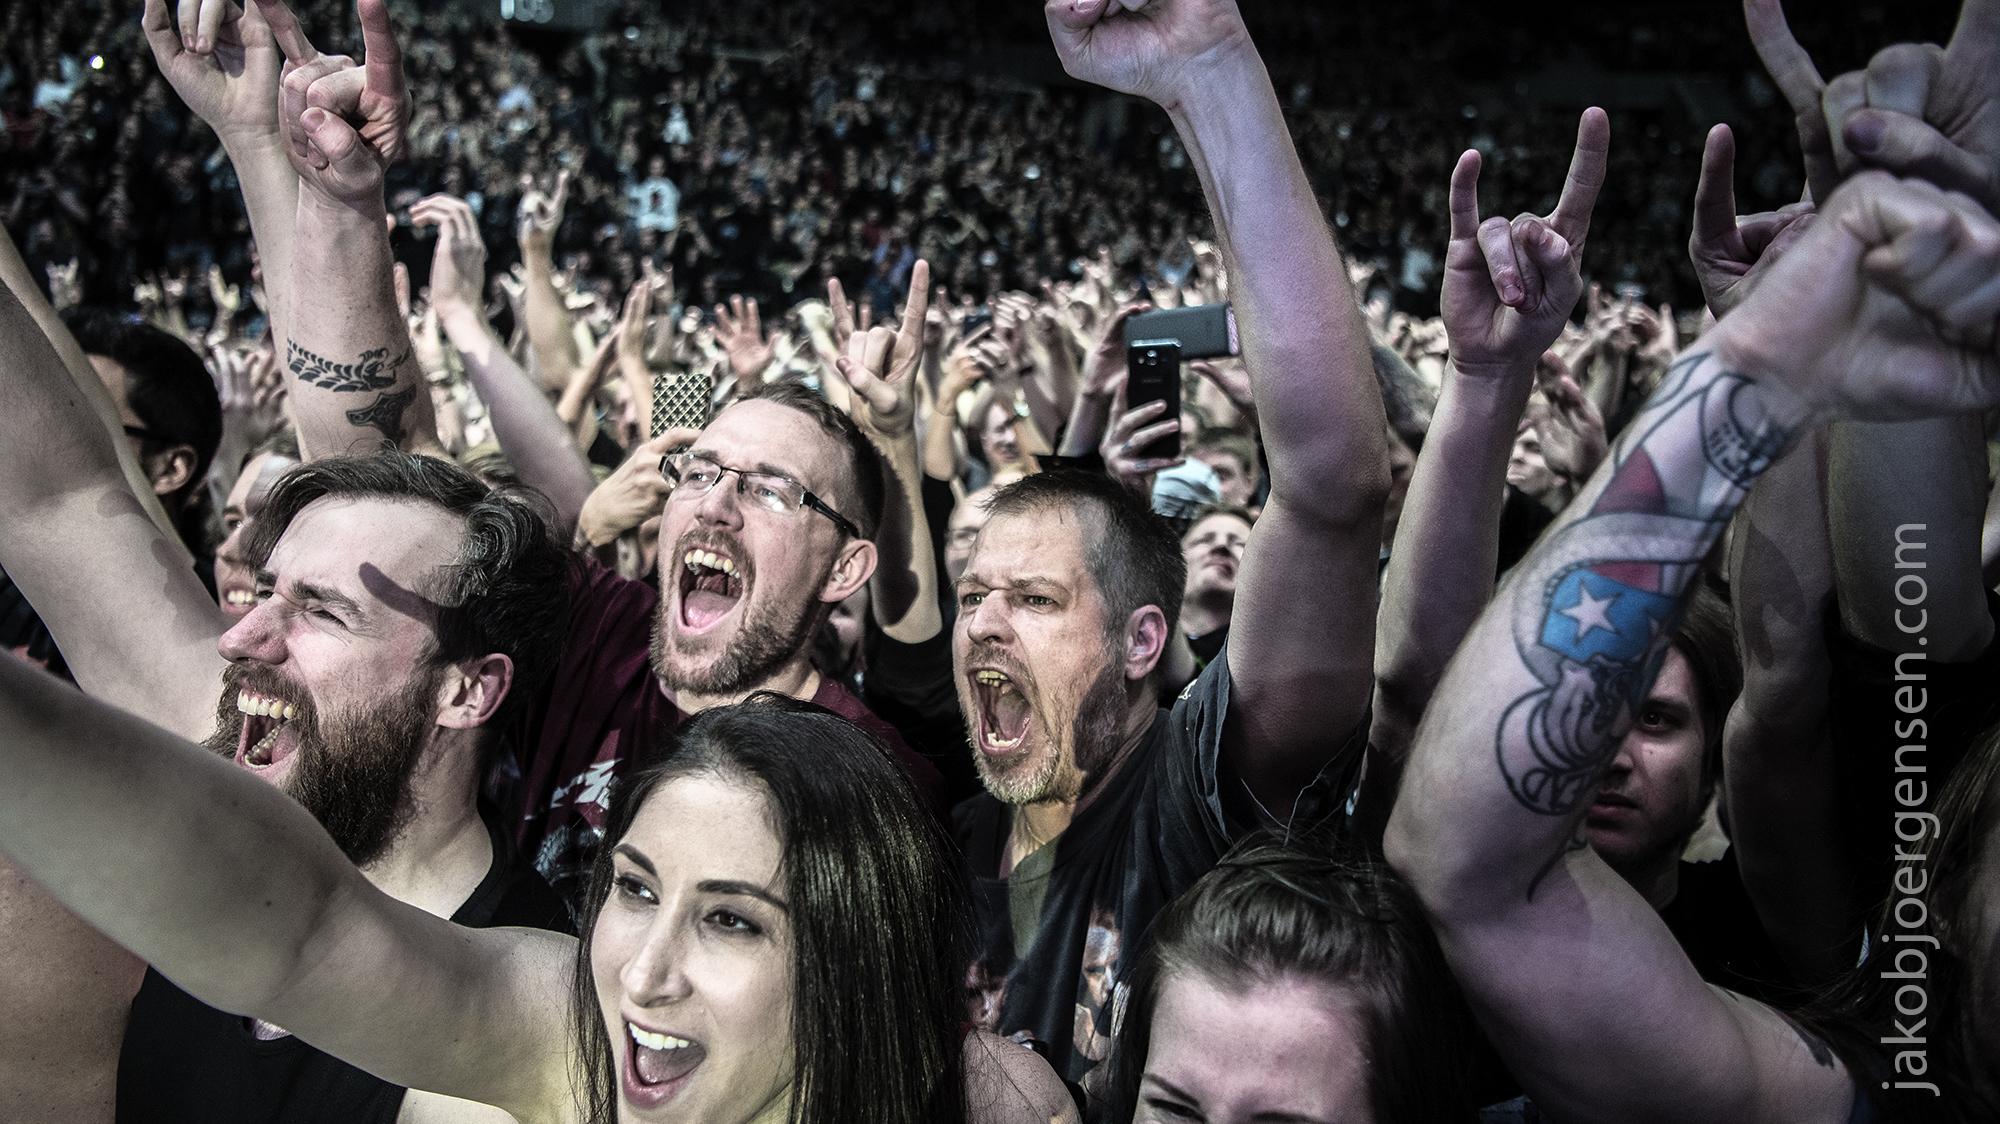 09-02-17_EB Metallica_0173.jpg